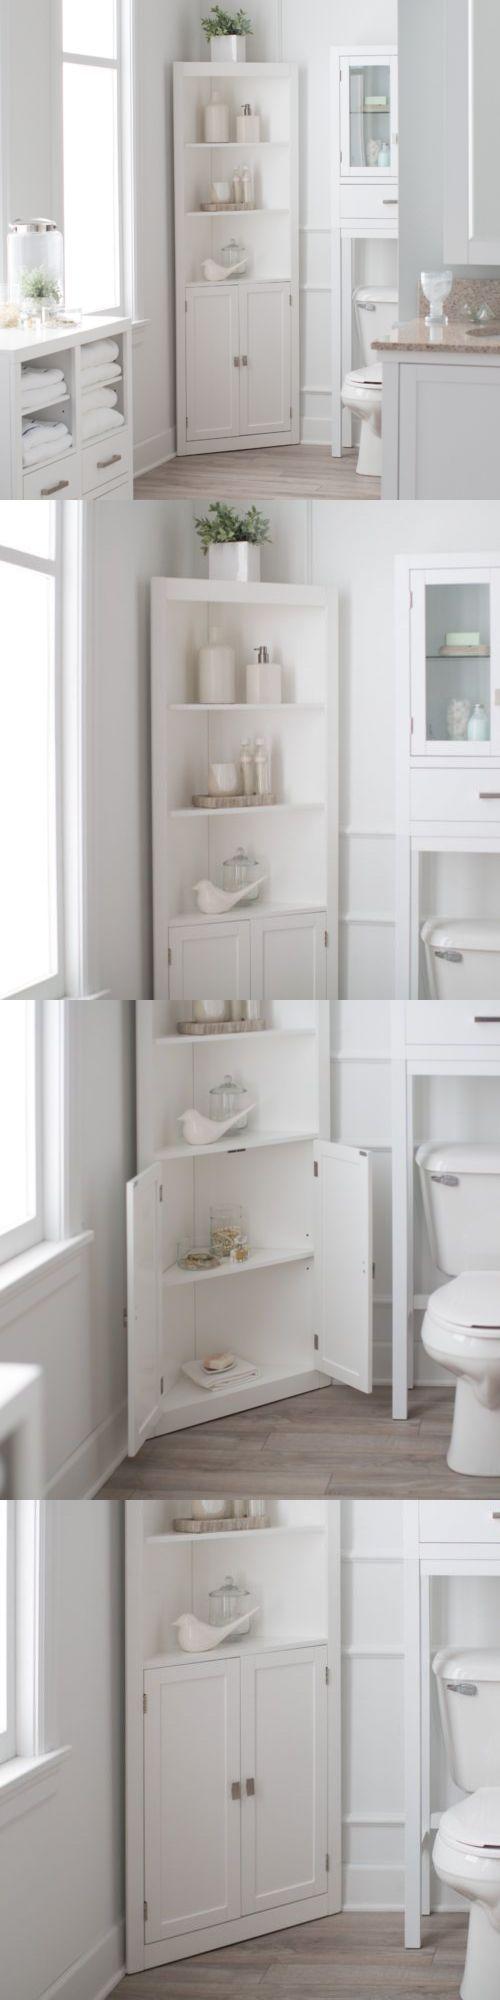 best 25 bathroom corner storage cabinet ideas on pinterest best 25 bathroom corner storage cabinet ideas on pinterest corner bathroom storage bathroom storage drawers and damask bathroom